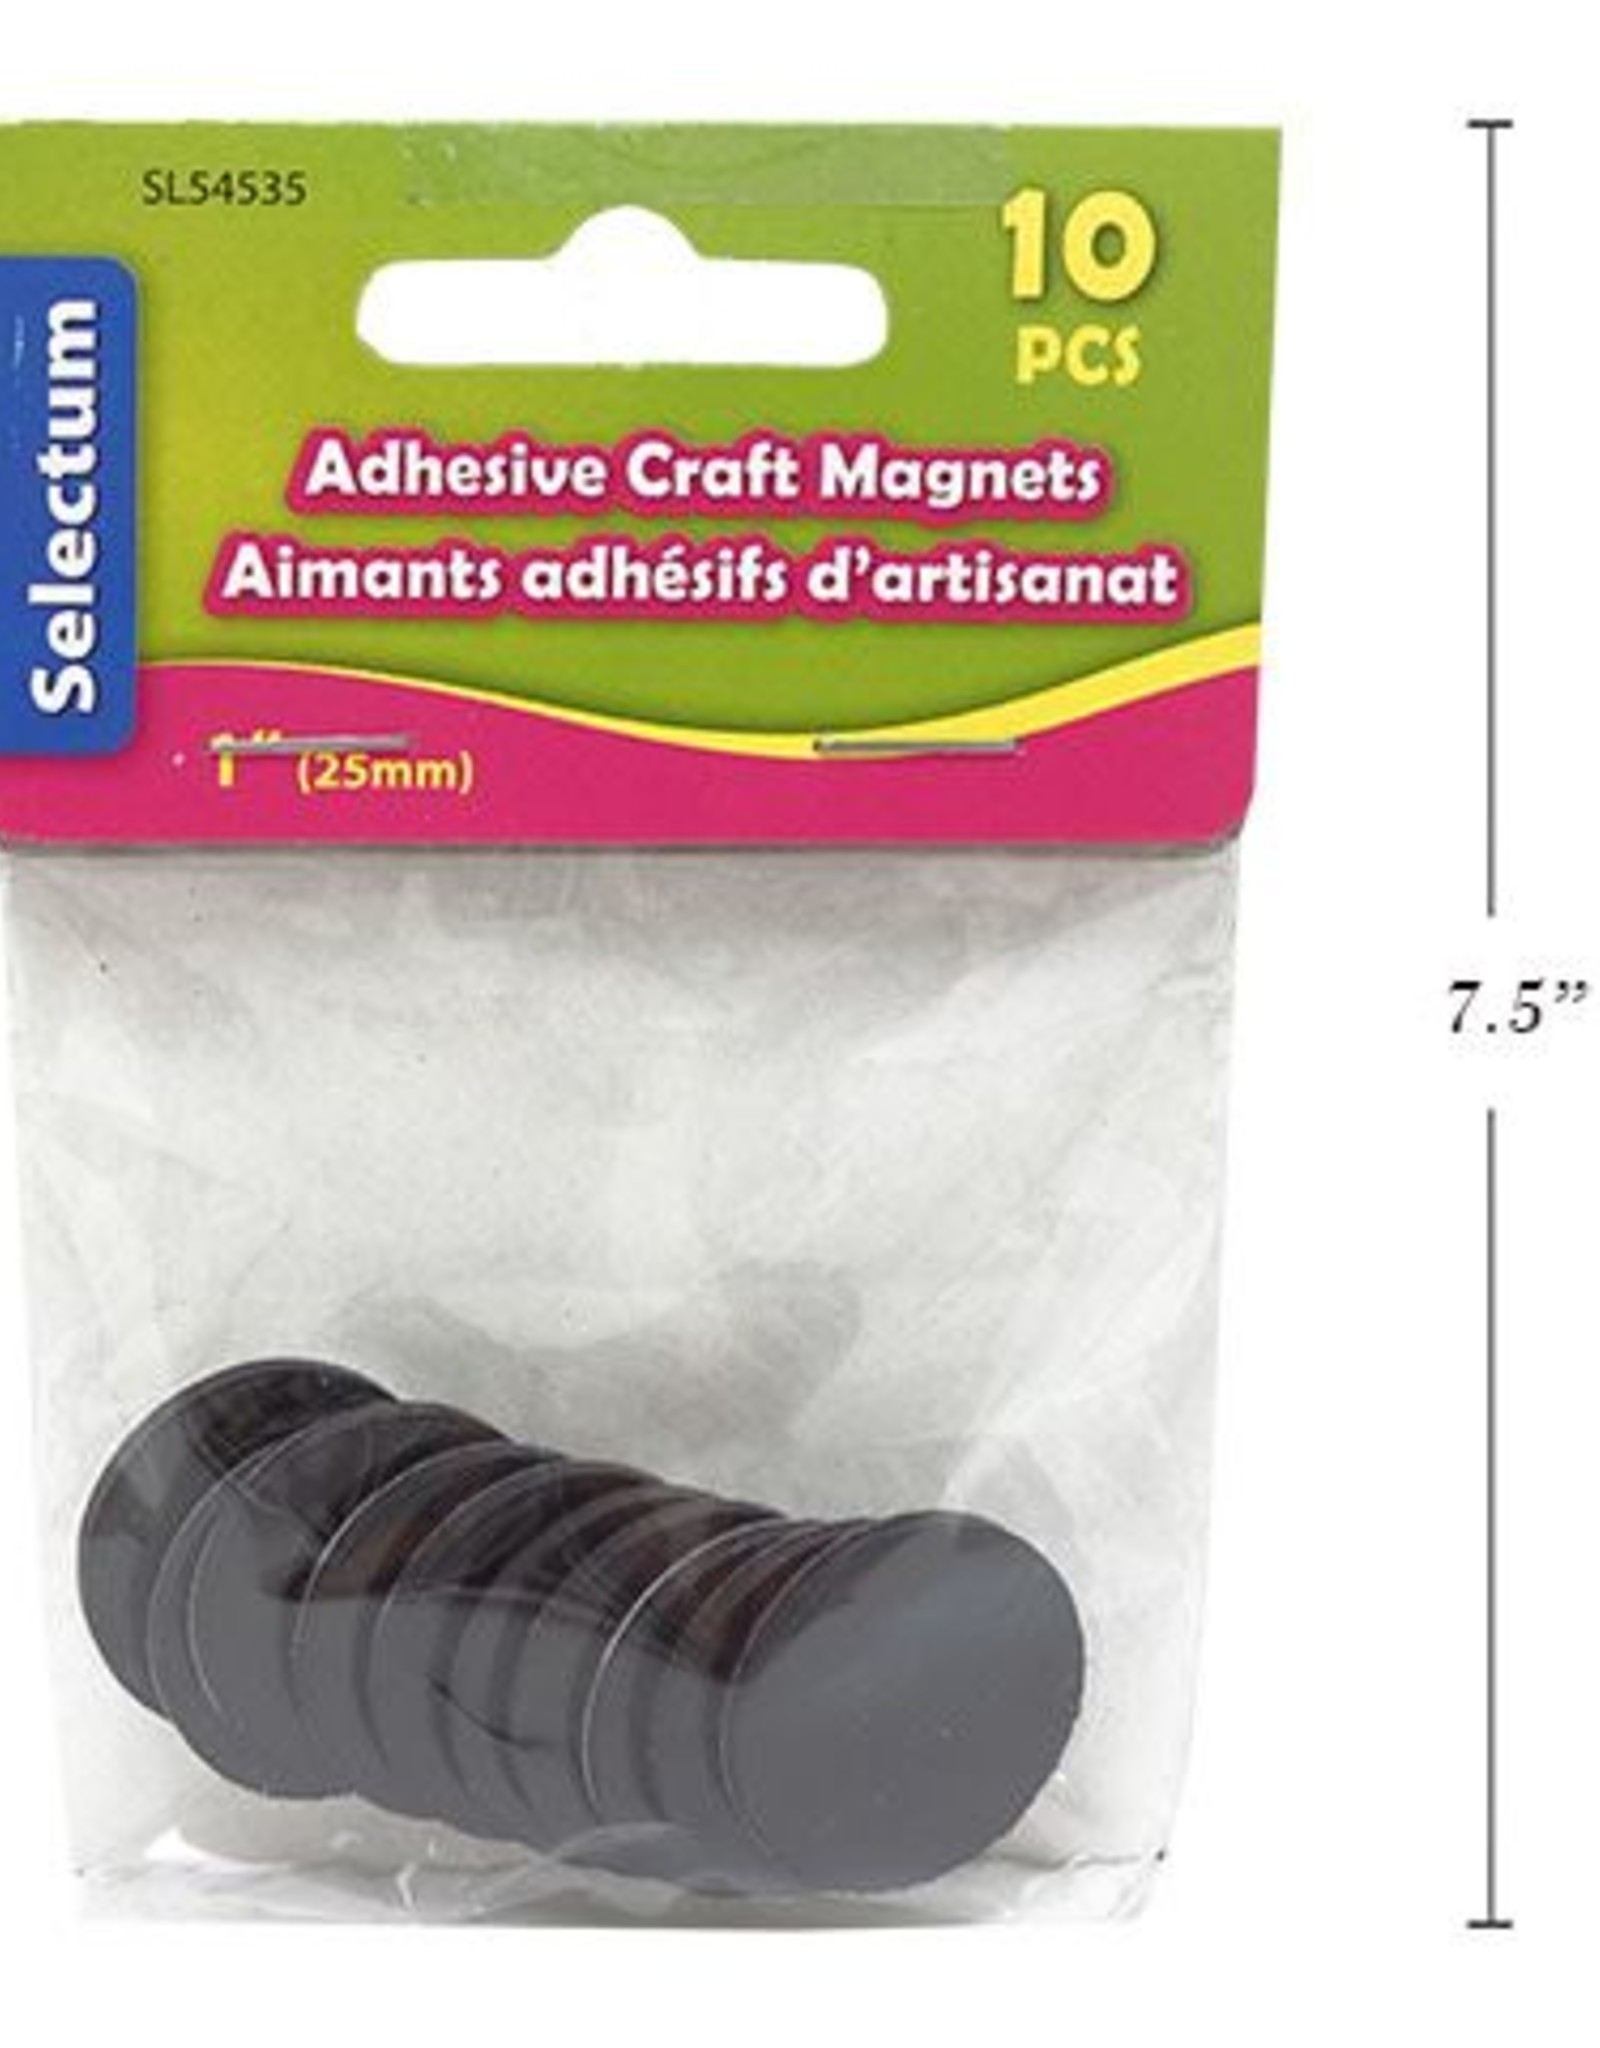 "1"" (25mm) Round Adhesive Craft Magnets 10/Pkg"